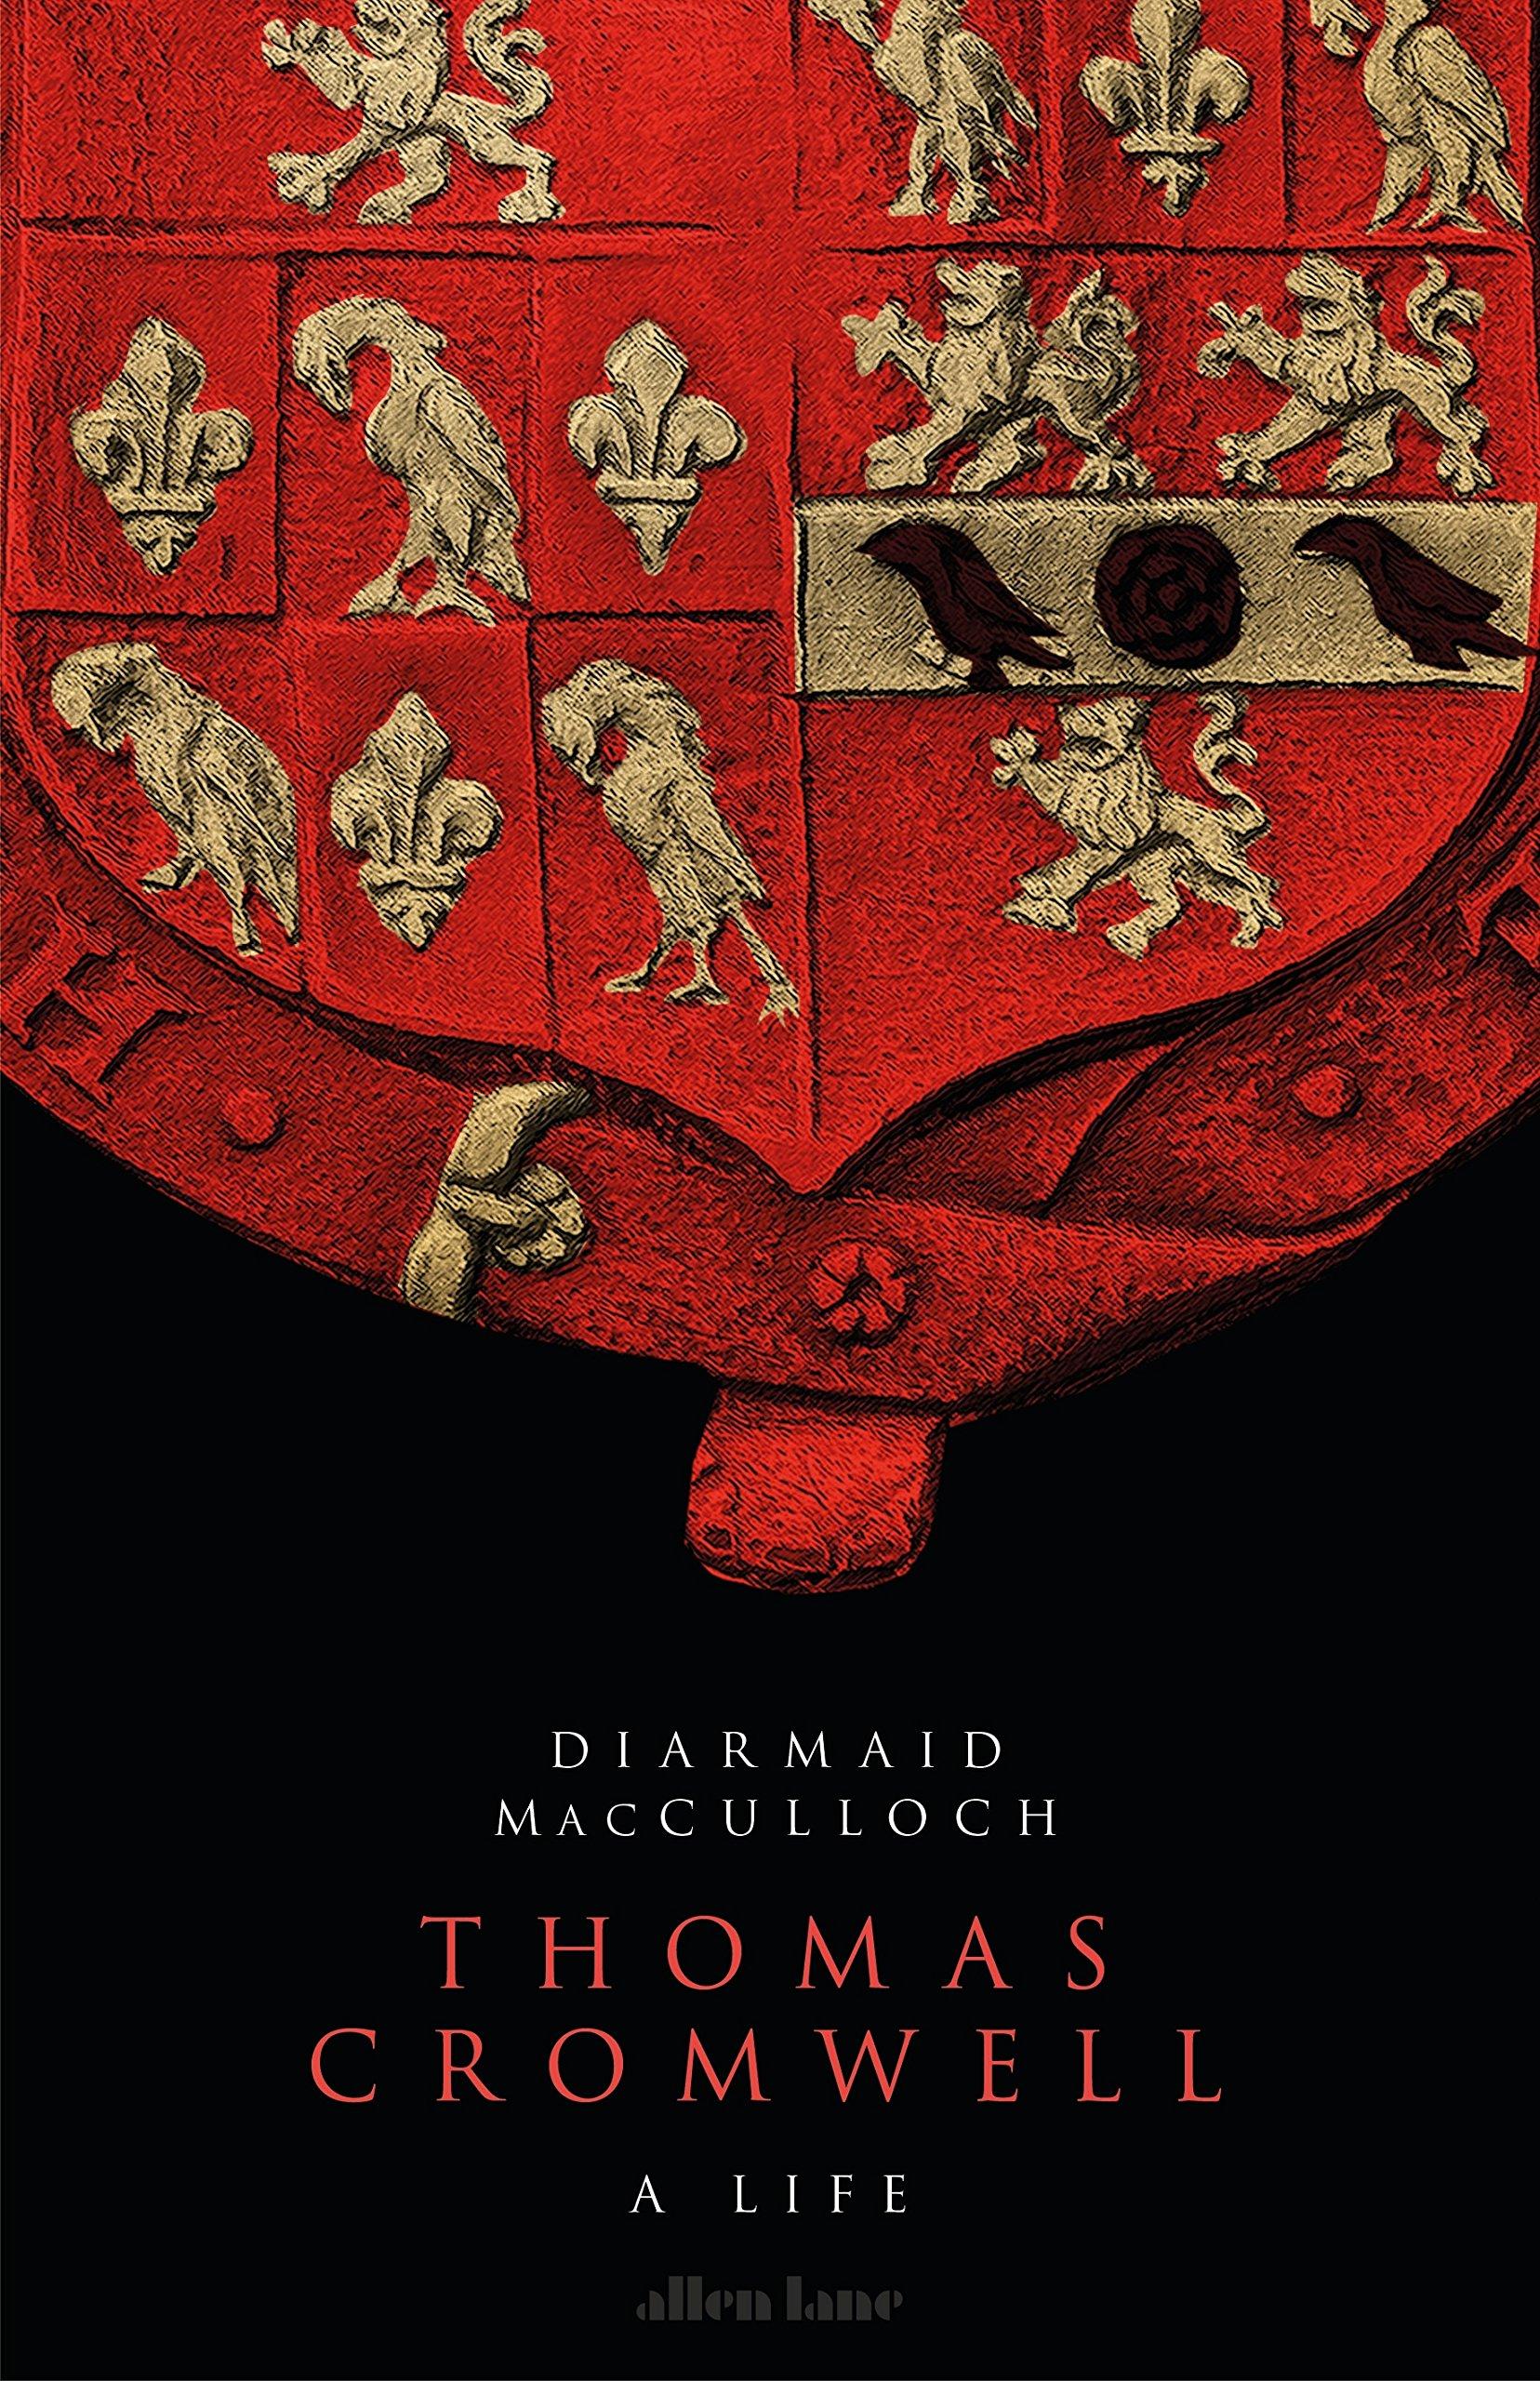 Thomas Cromwell: A Life: Amazon.es: Macculloch, Diarmaid ...